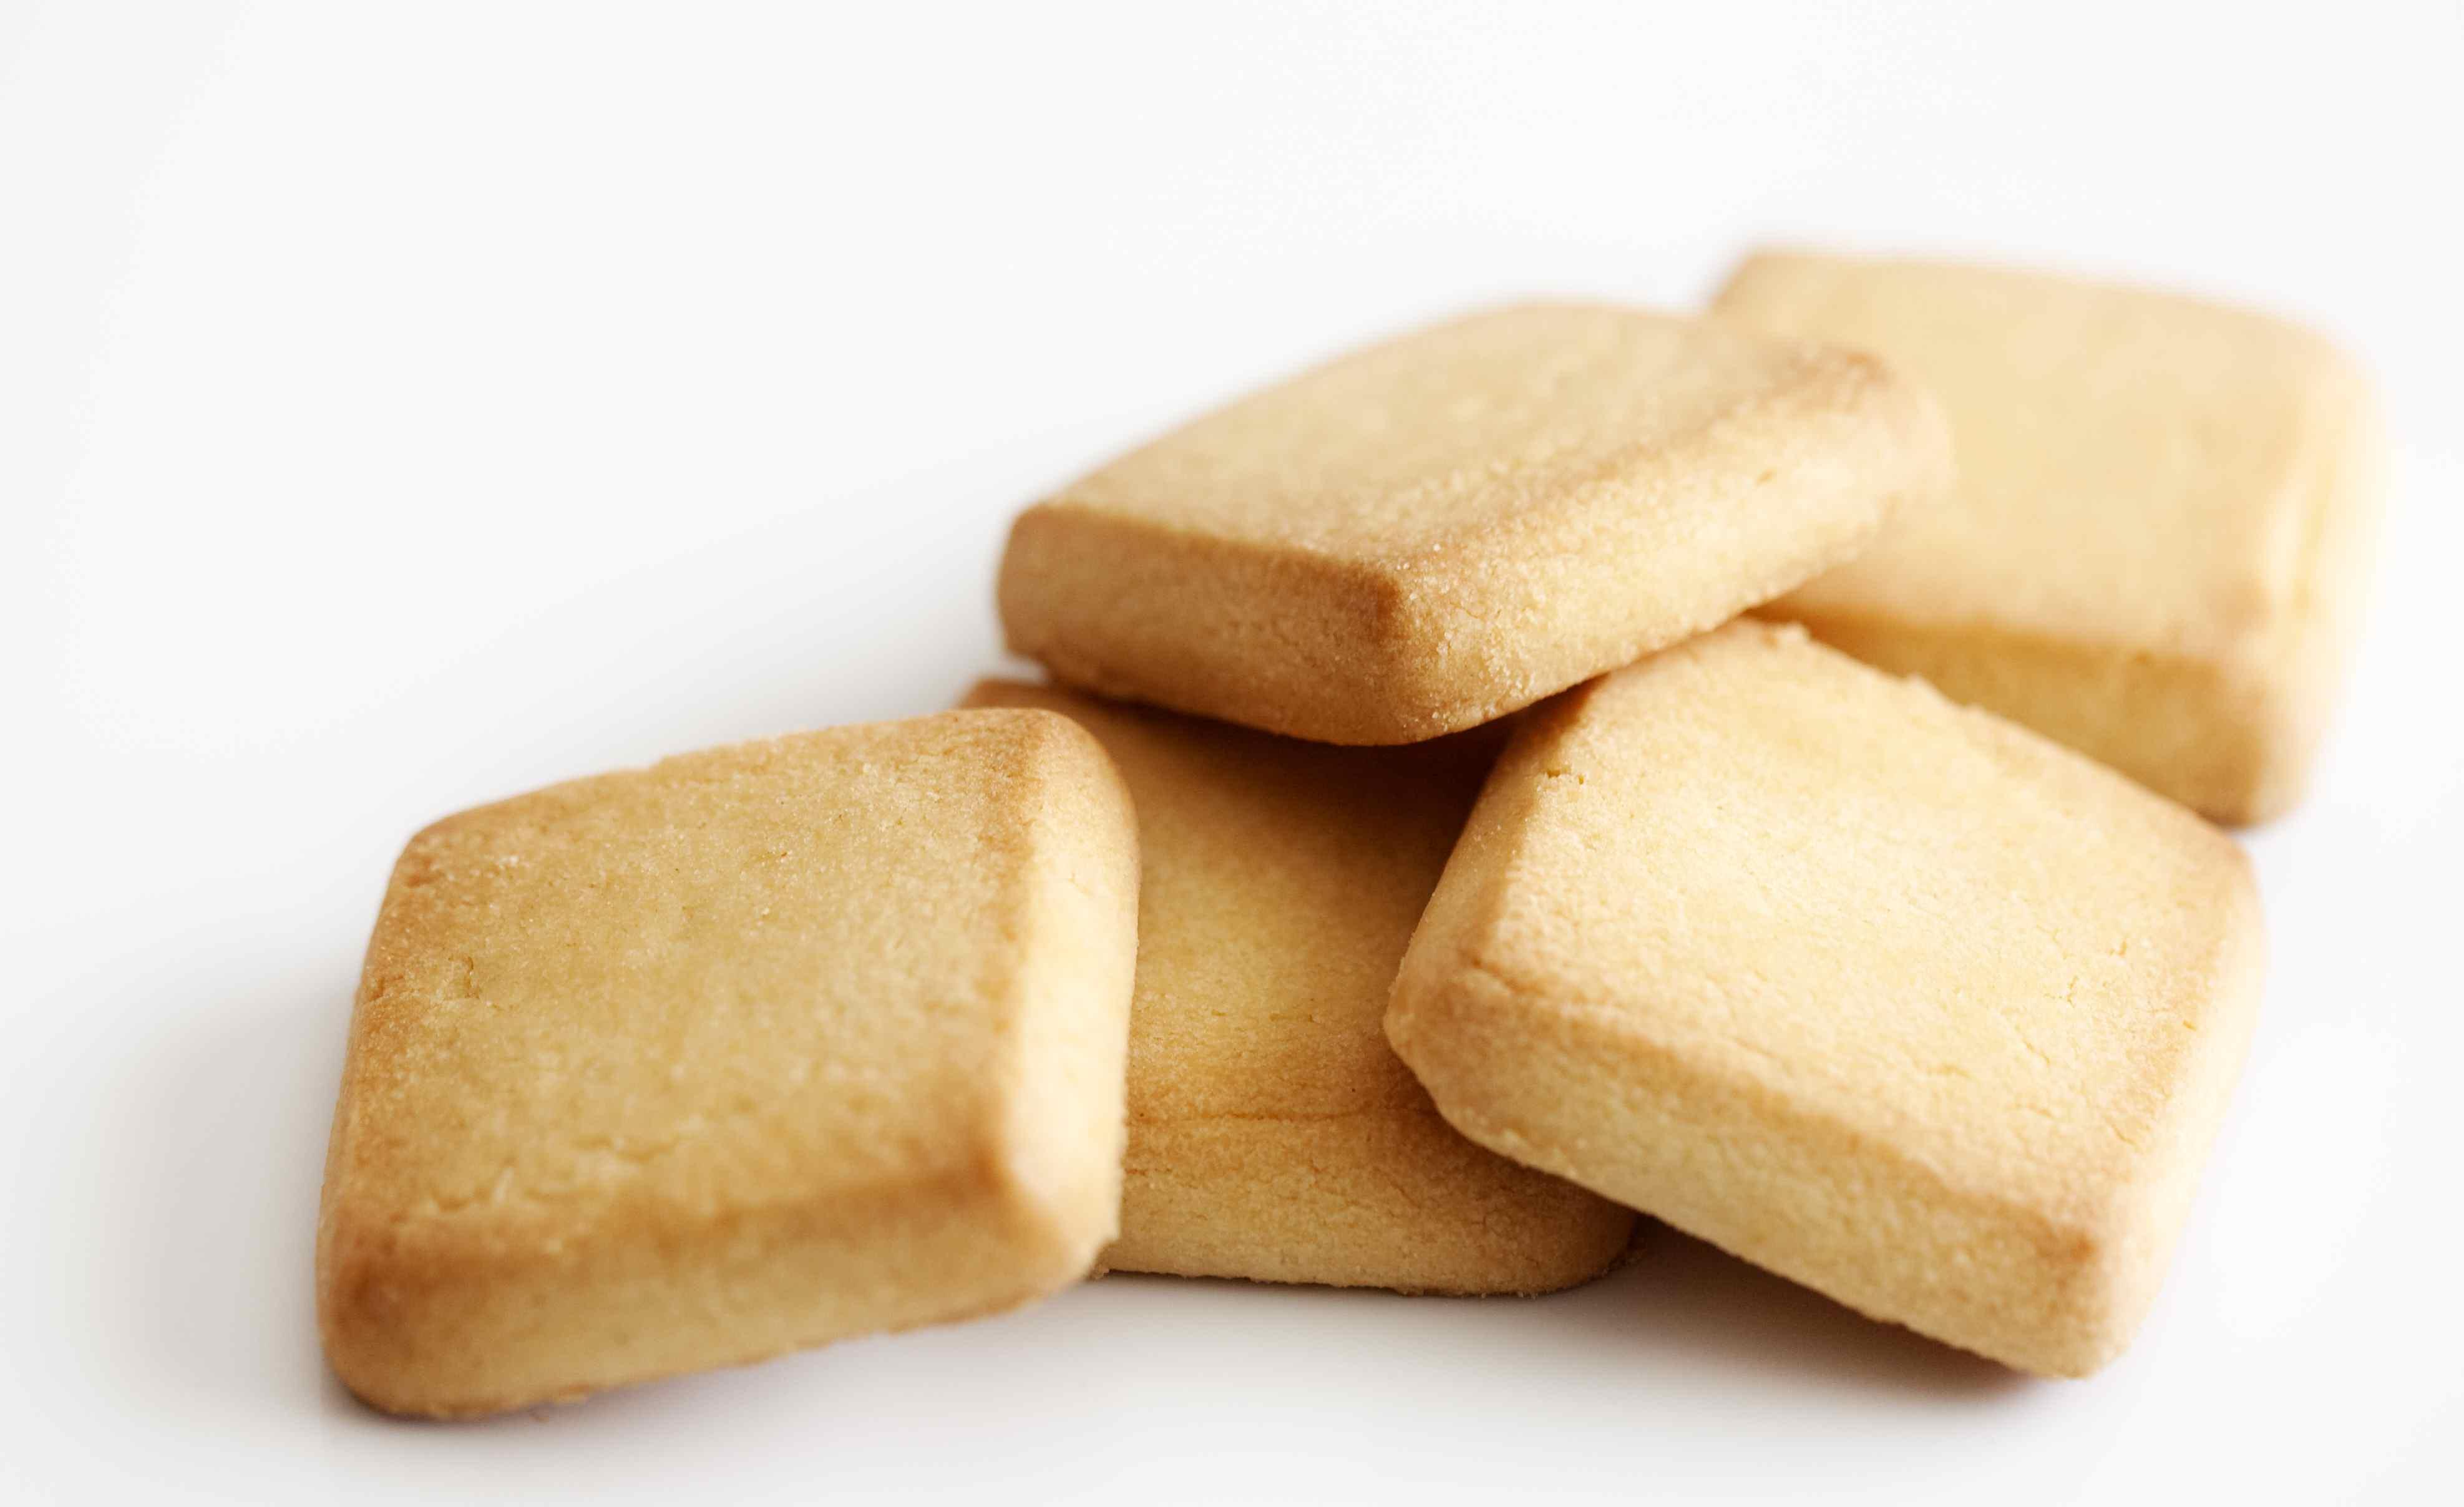 Five square-shaped gluten-free vanilla wafers